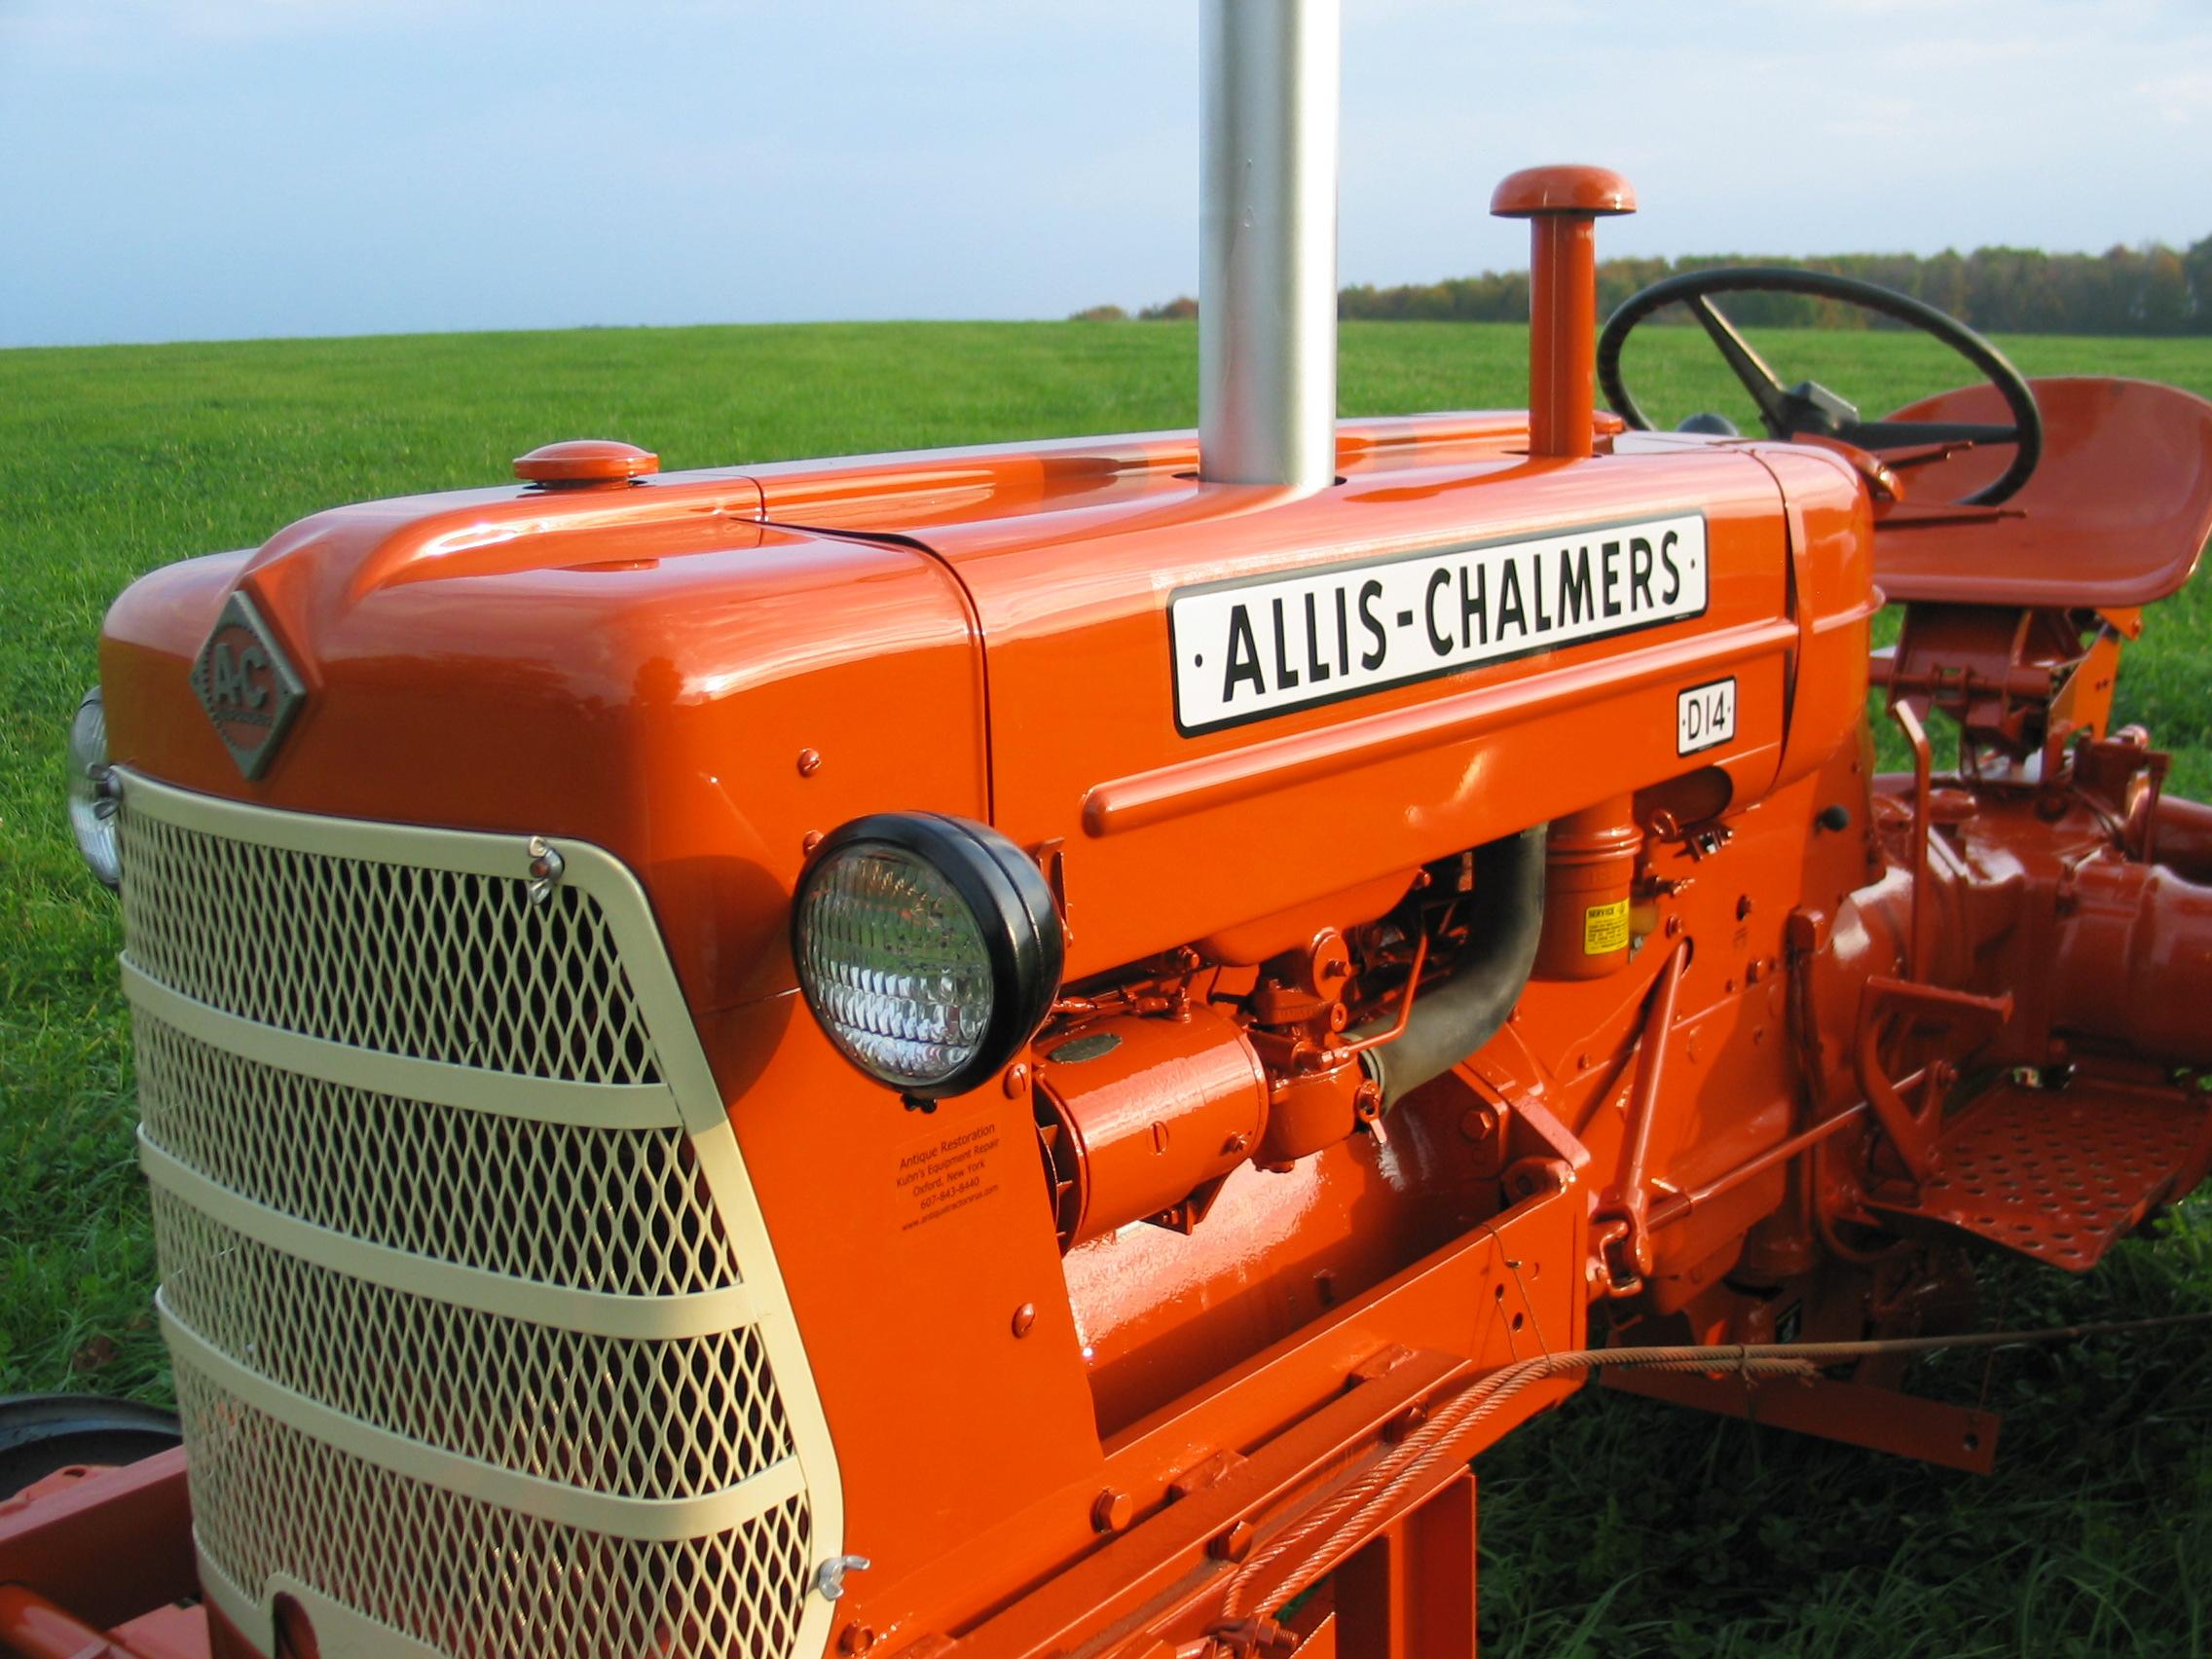 Allis Chalmers D 14 Restoration | Kuhn's Equipment Repair